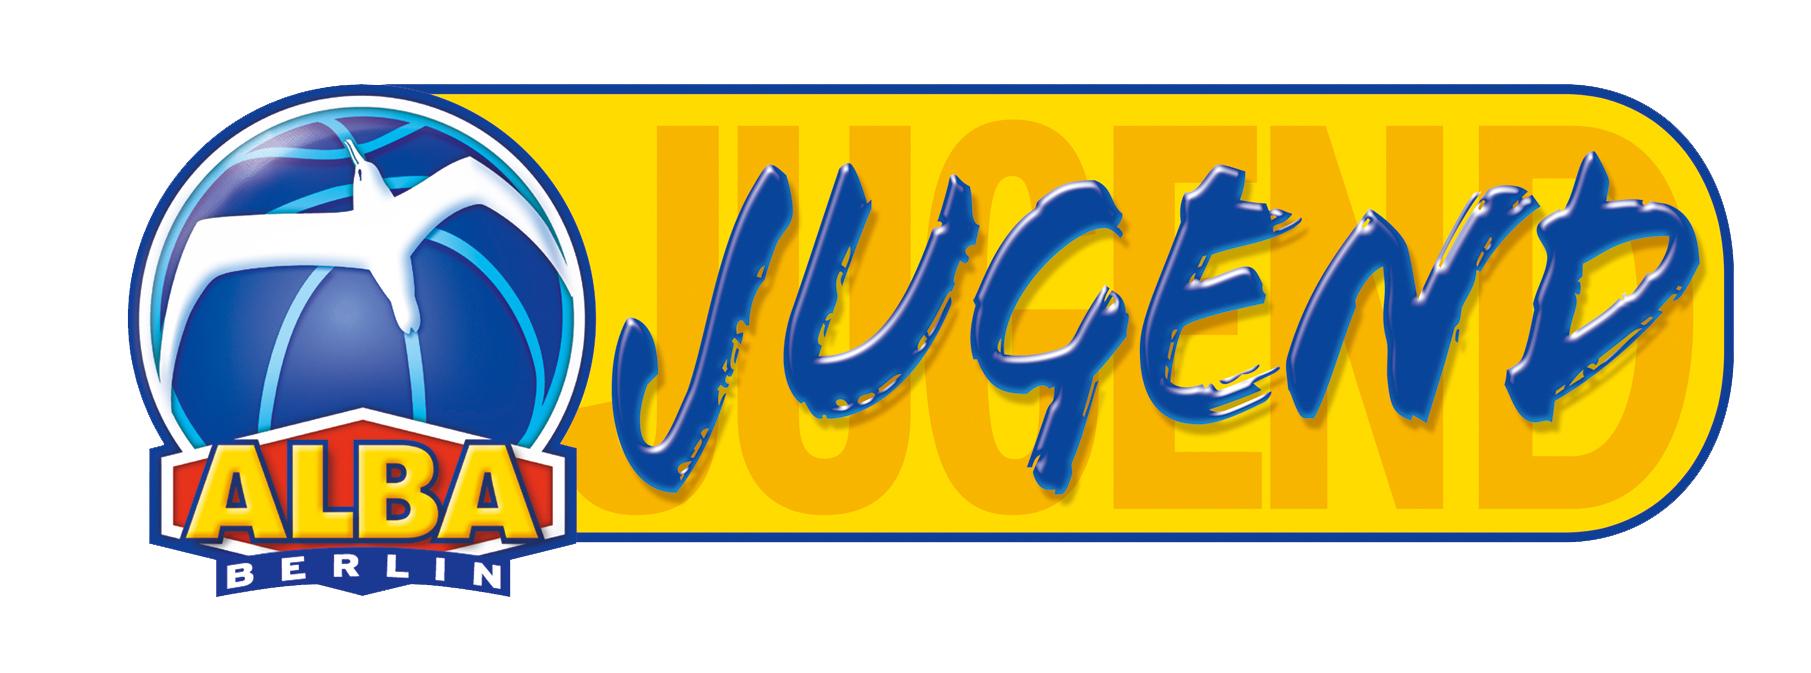 Logo ALBA Jugend frei